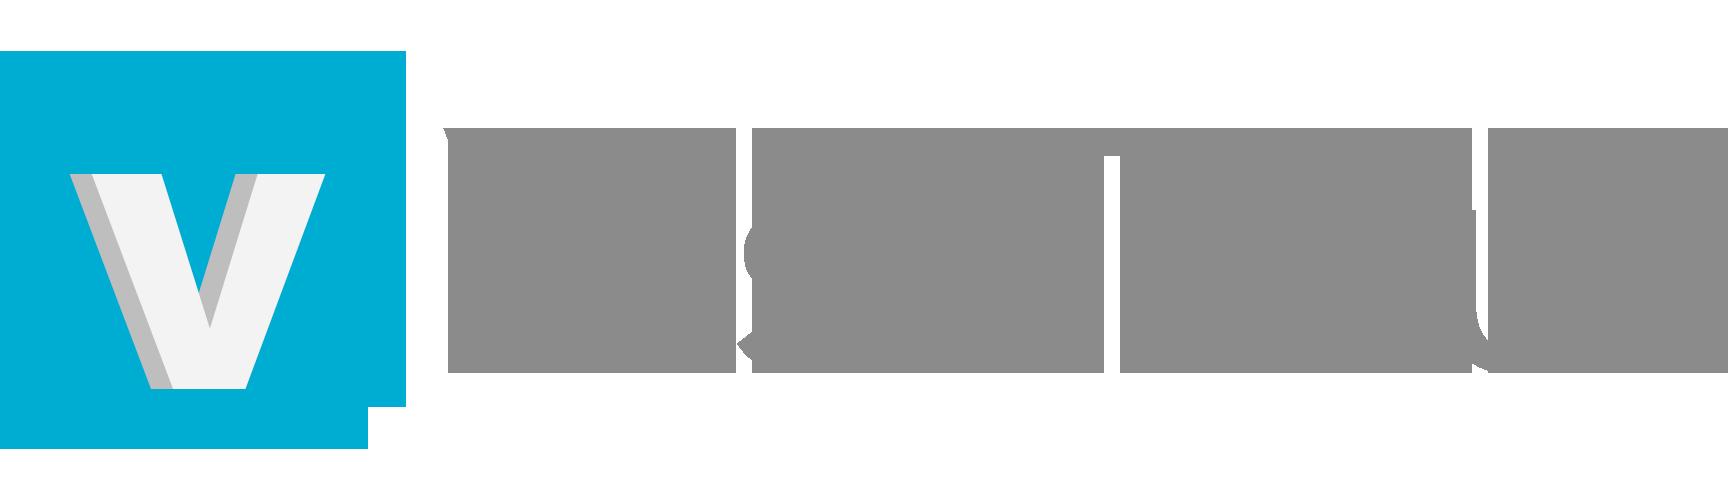 VisuTour